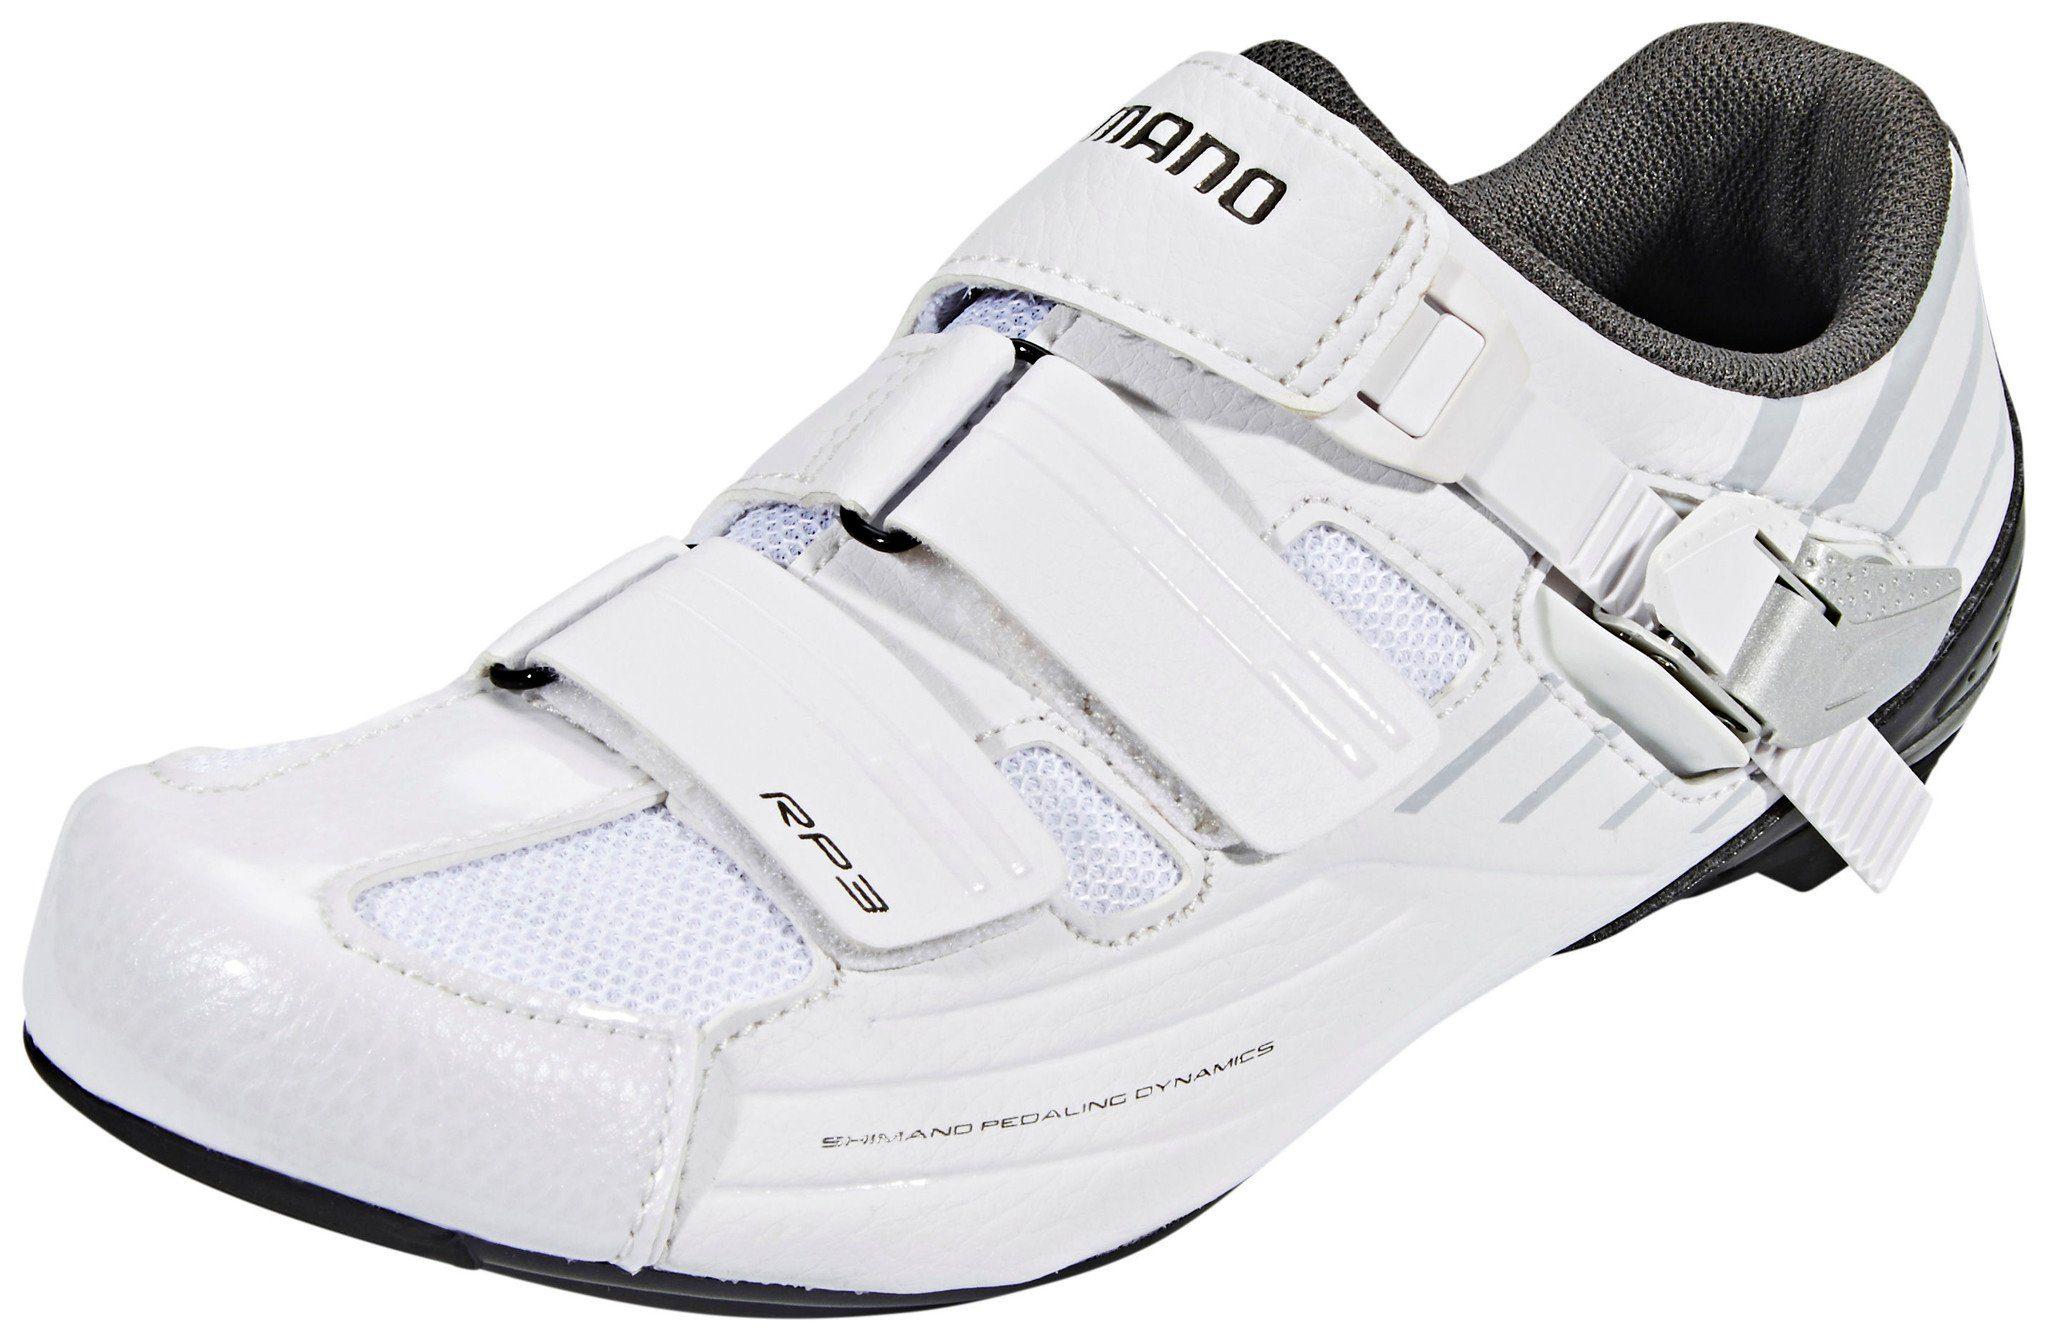 Shimano Fahrradschuhe SH-RP3W Schuhe Unisex  weiß